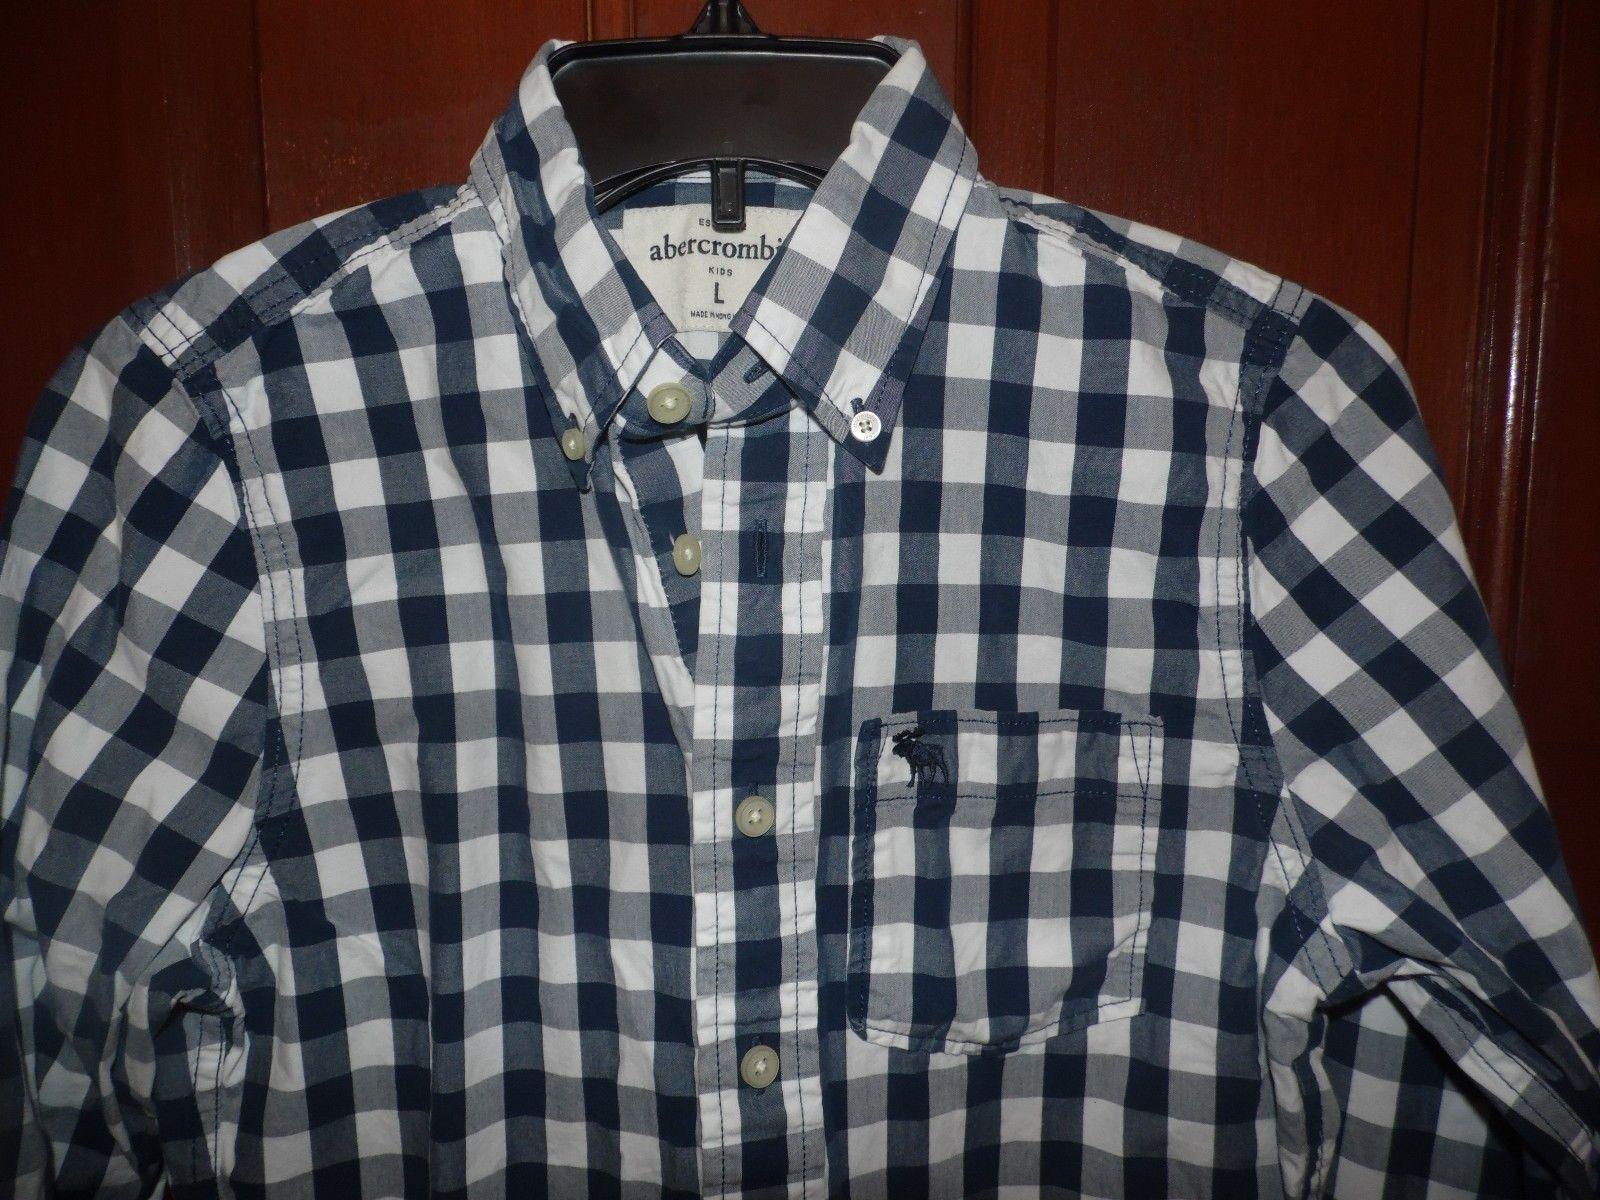 d0d0a5f8 Boy's Abercrombie Kids Muscle LS Button Down Blue White Checked Shirt Large  EUC